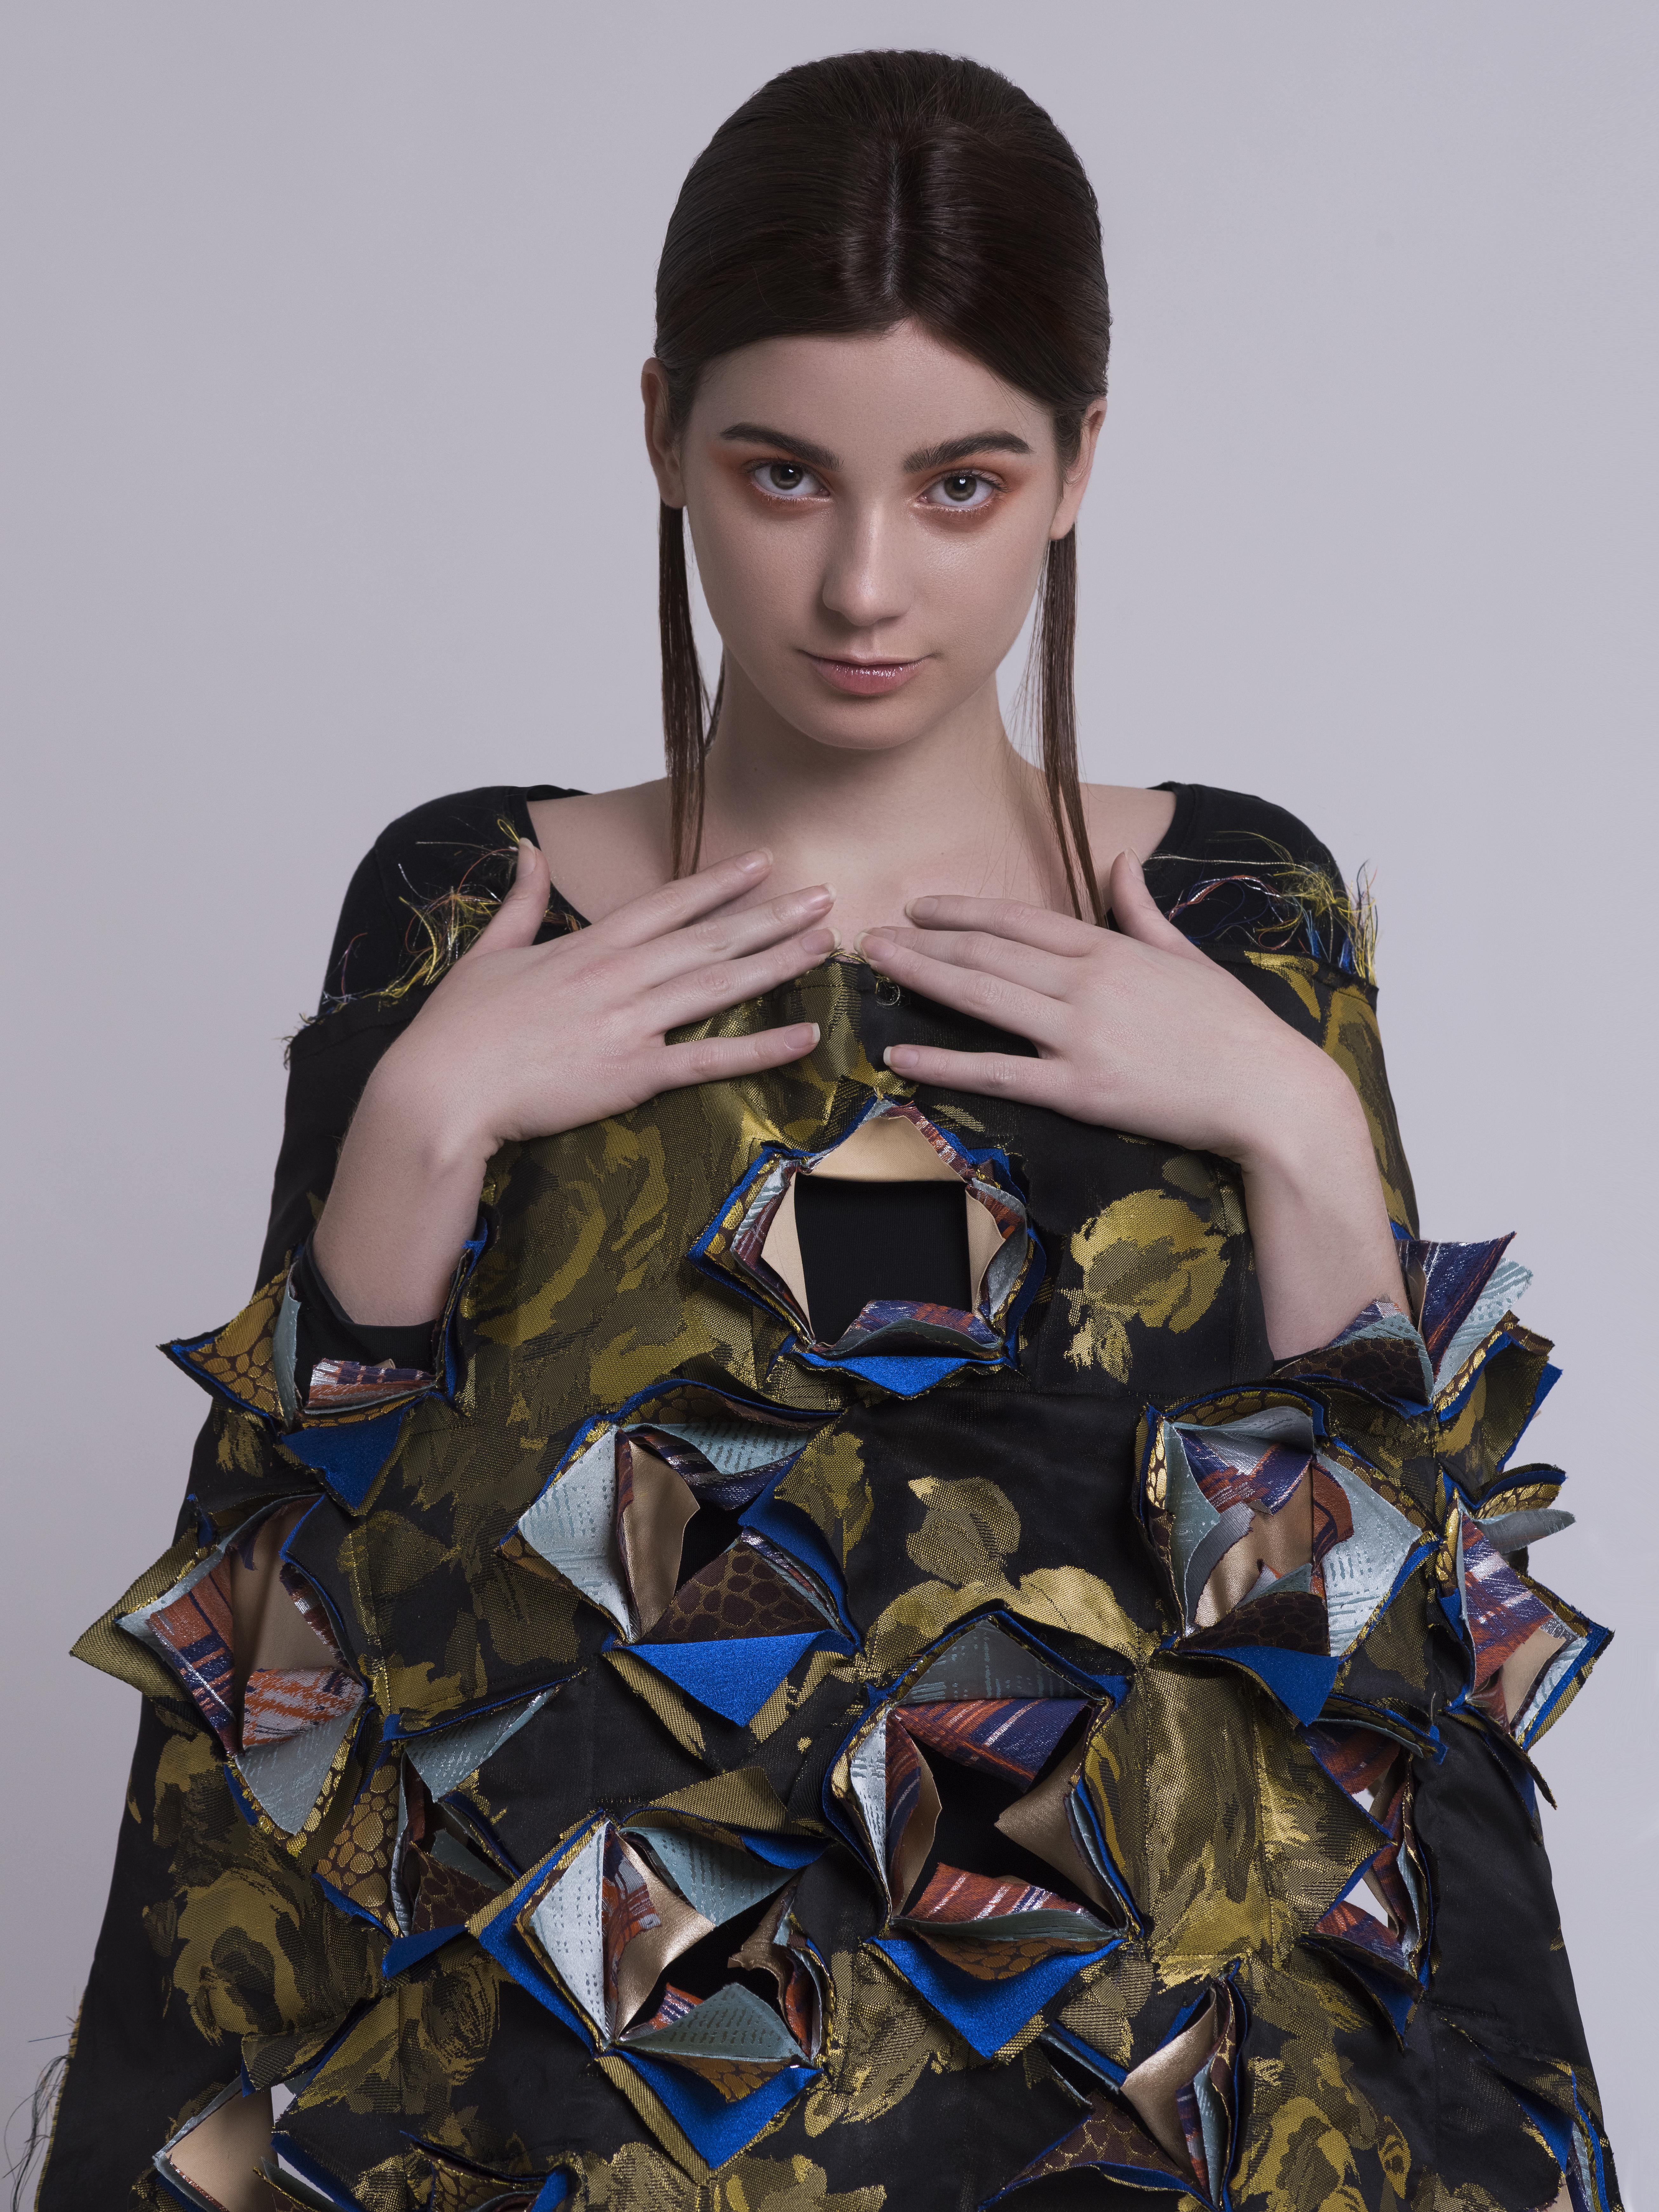 Hairstylist & Designer Daniela Sipos